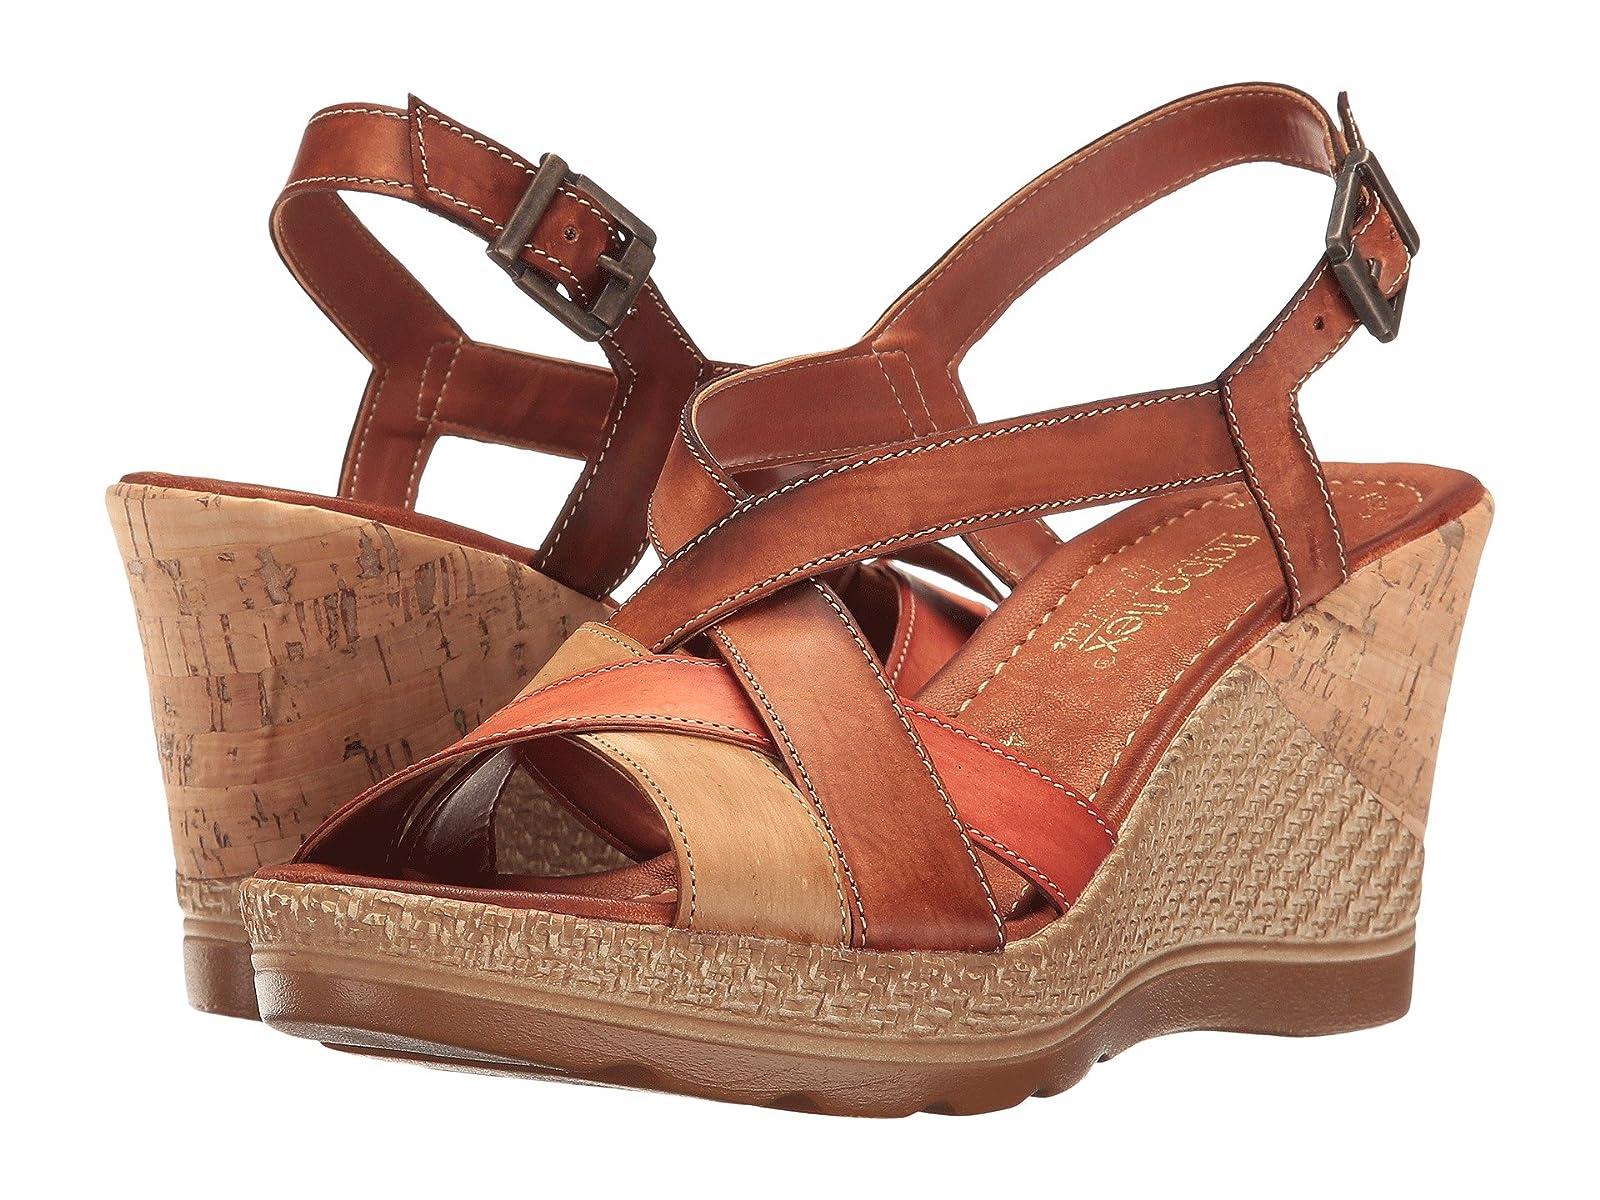 David Tate ModenaCheap and distinctive eye-catching shoes